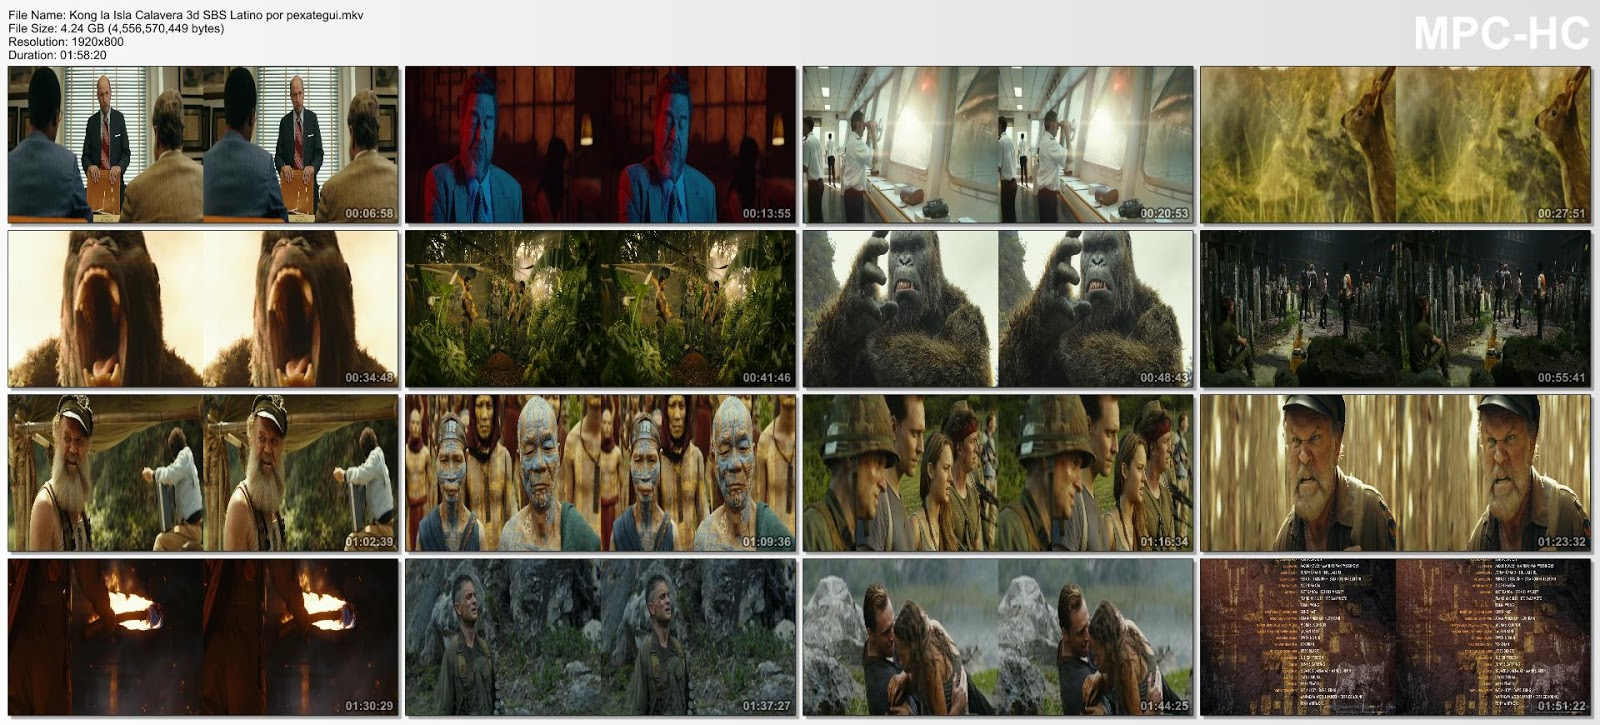 Kong: La Isla Calavera (2017) HD 3D 1080p Español Latino 3